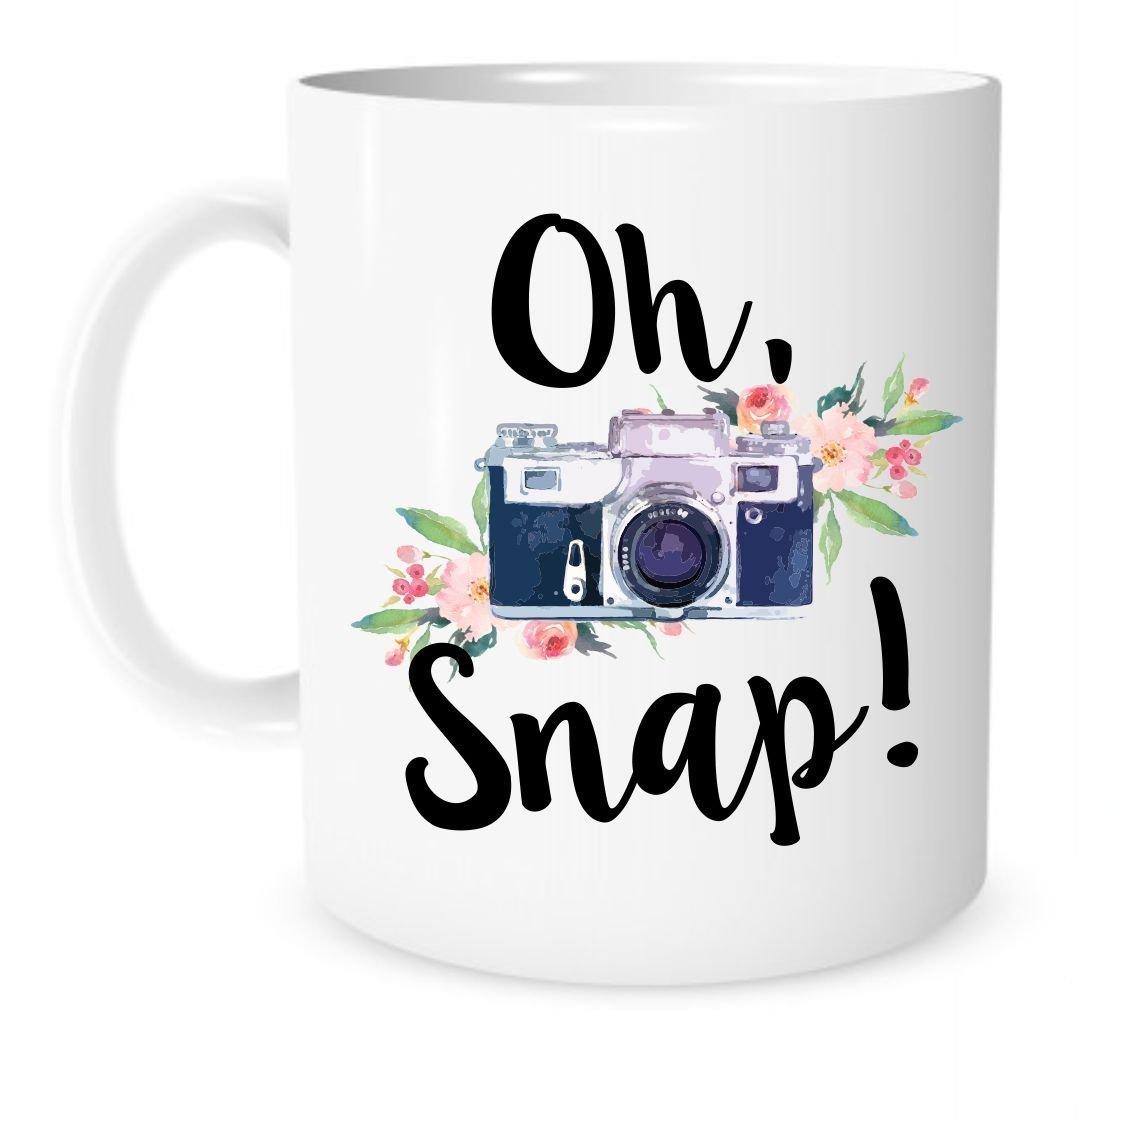 11 Ounce White Ceramic Coffee or Tea Mug Gift for Photographer Photography Cup Photo Editing Mug Oh Camera Mug Christmas Present The Coffee Corner Snap